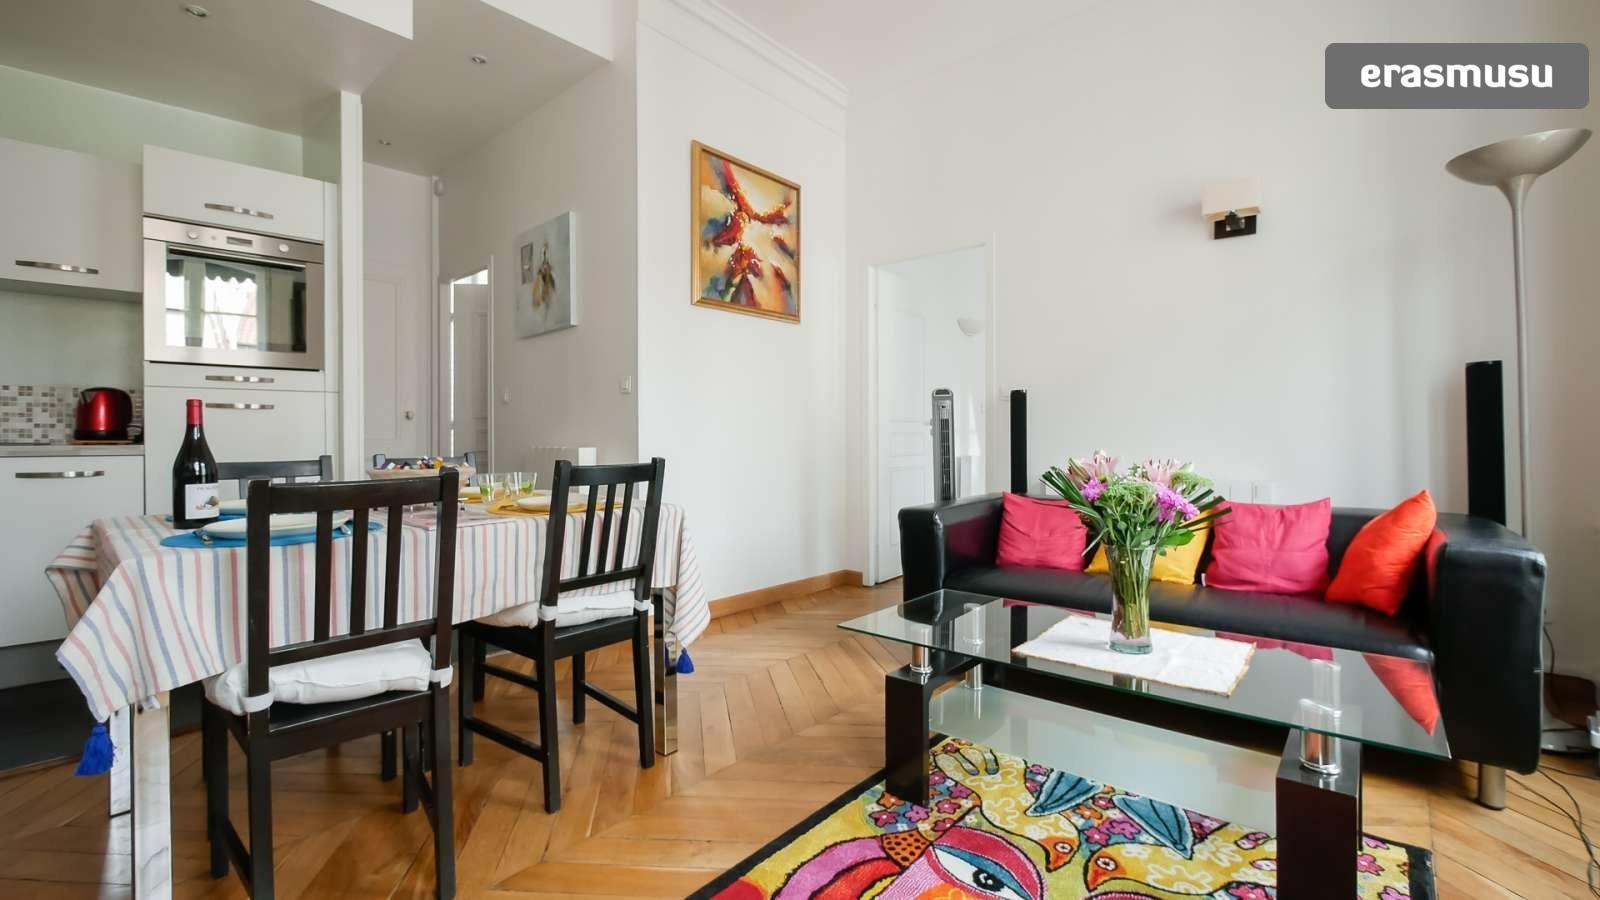 spacious-2-bedroom-apartment-rent-cordeliers-02d7d56819c78c8f825